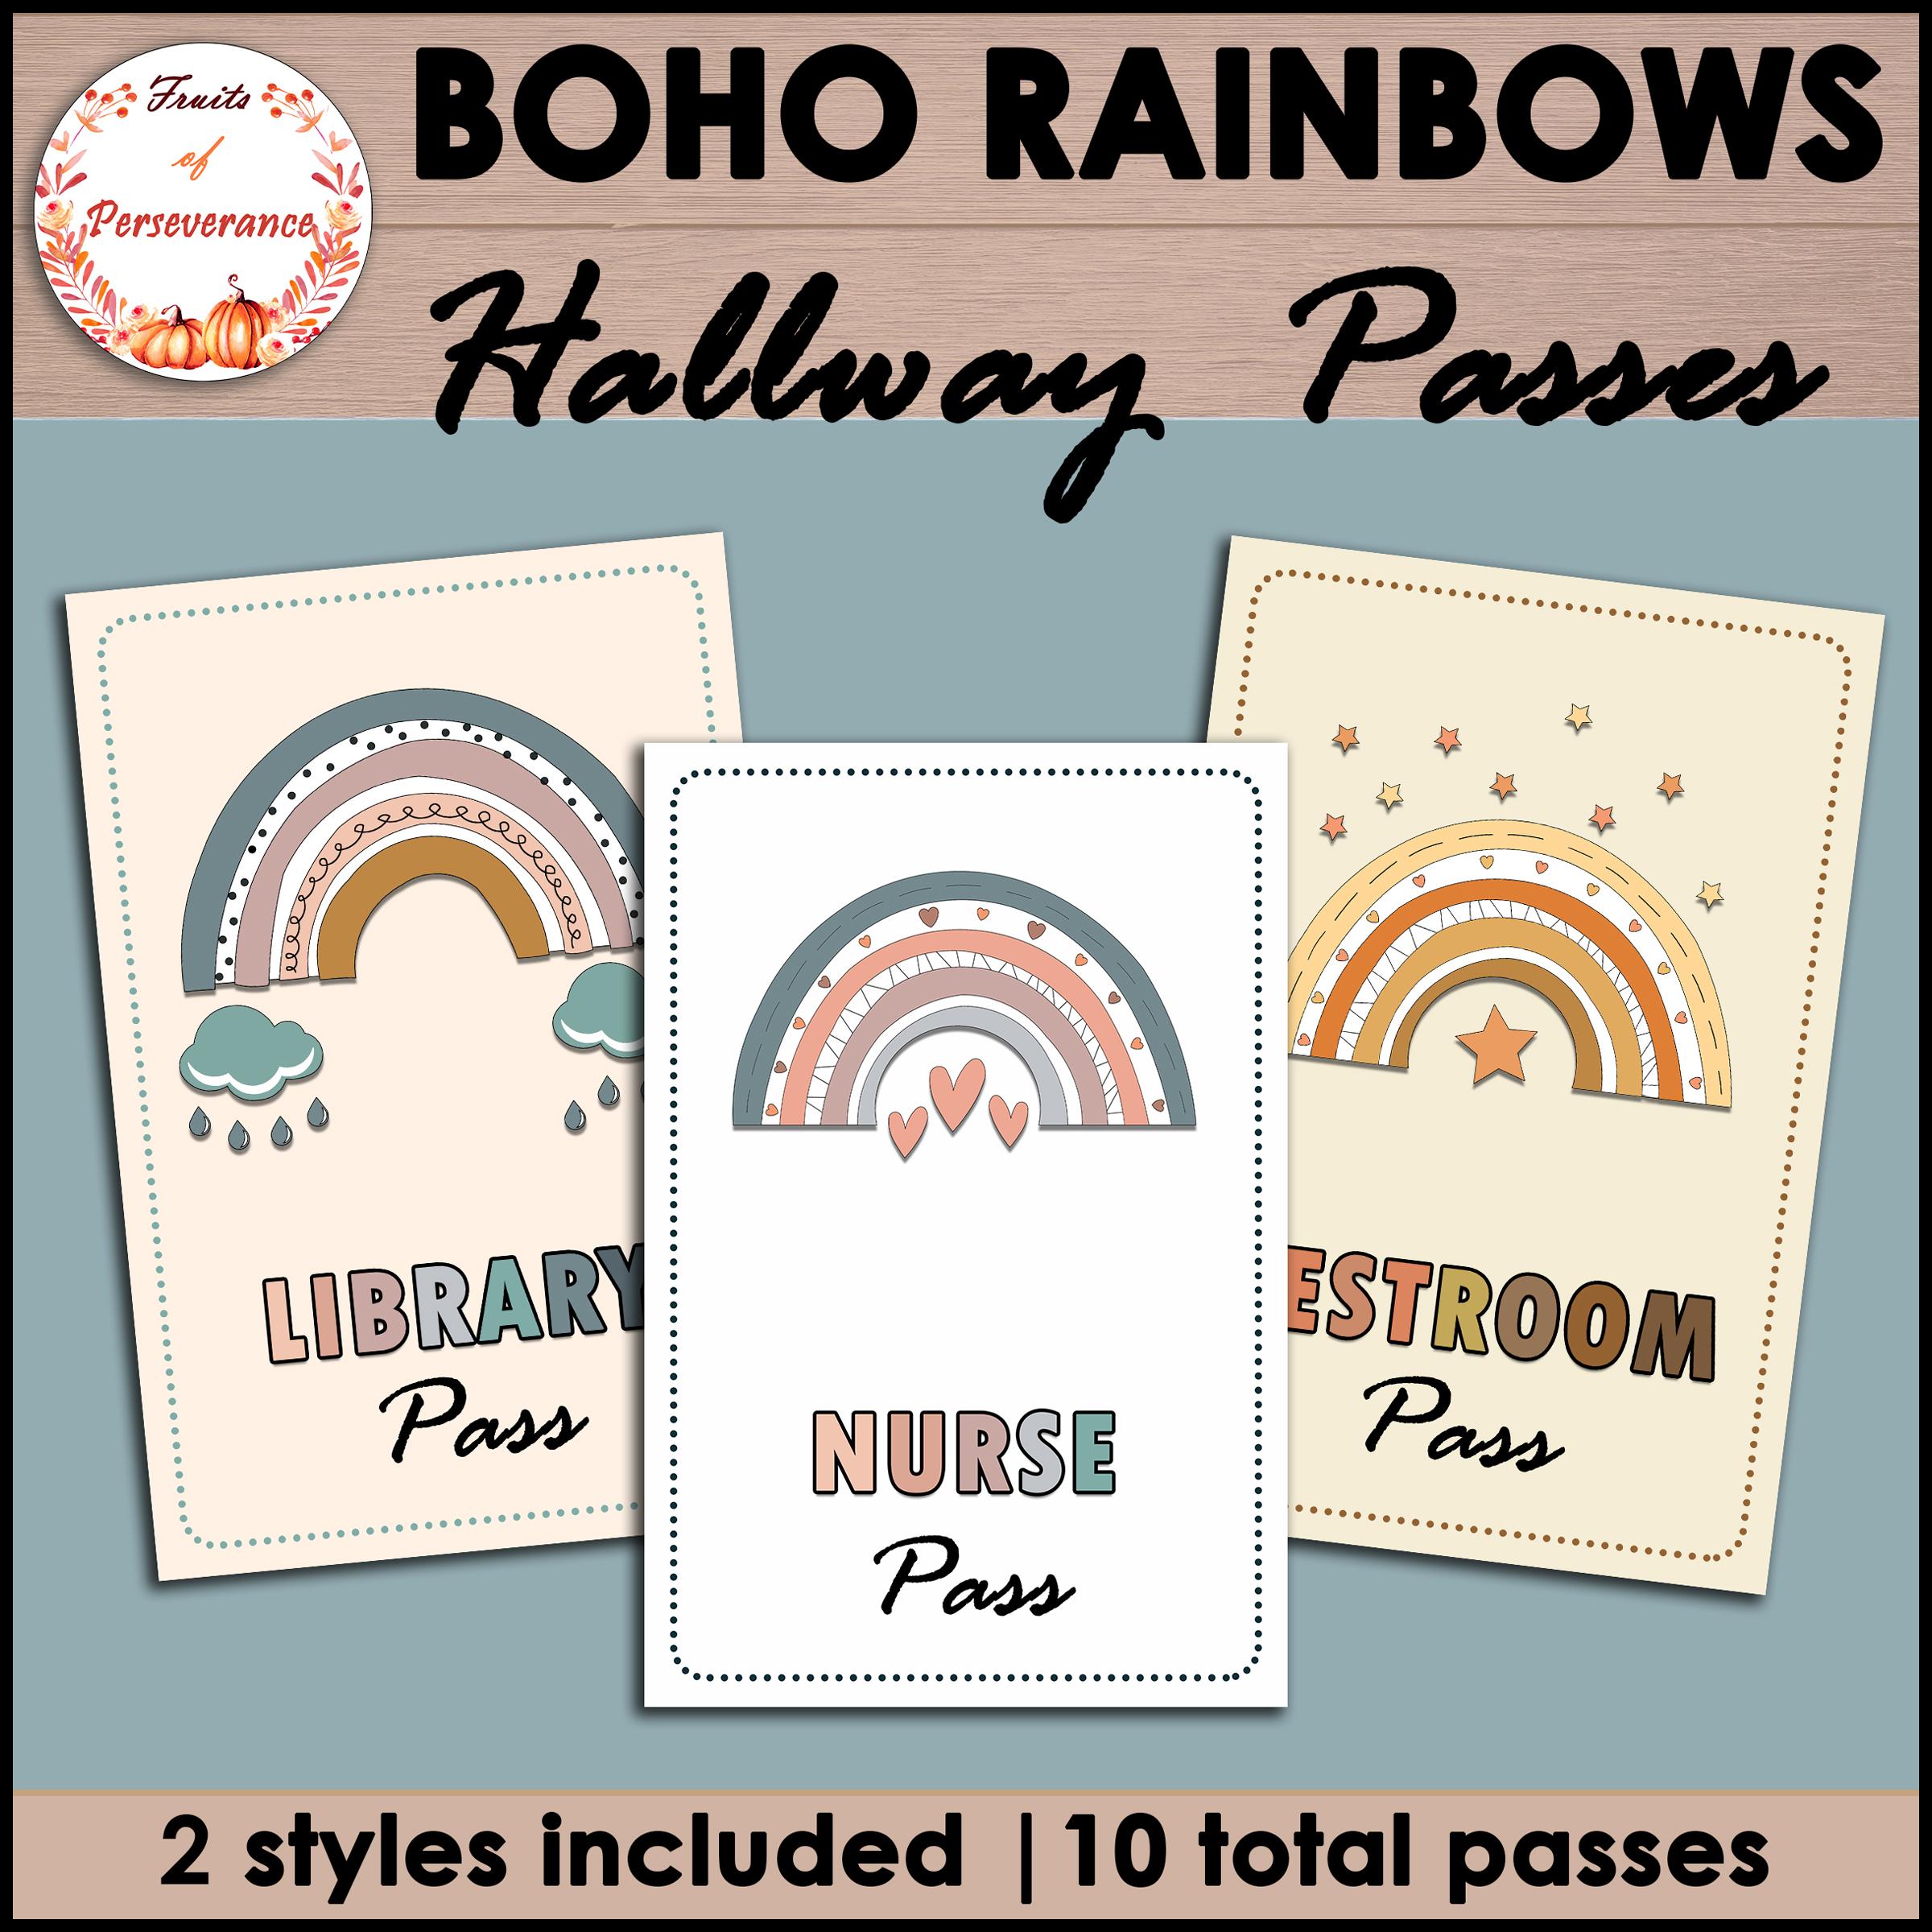 Hall and Restroom Passes Boho Rainbow Theme